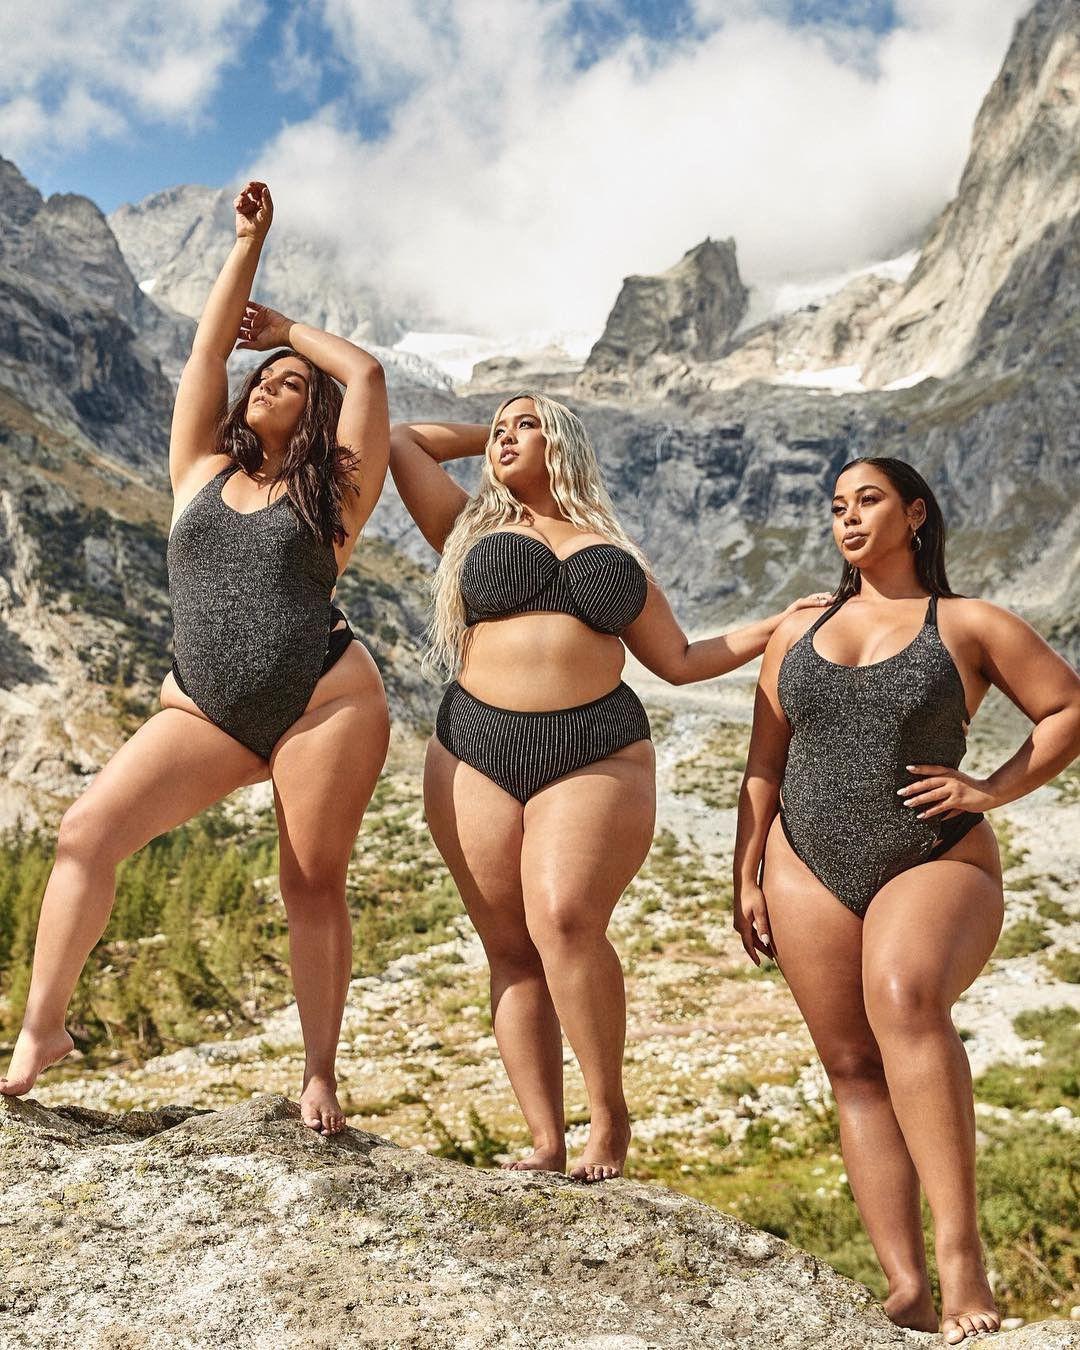 gabifresh (With images) | Gabi fresh, Swimsuits for all